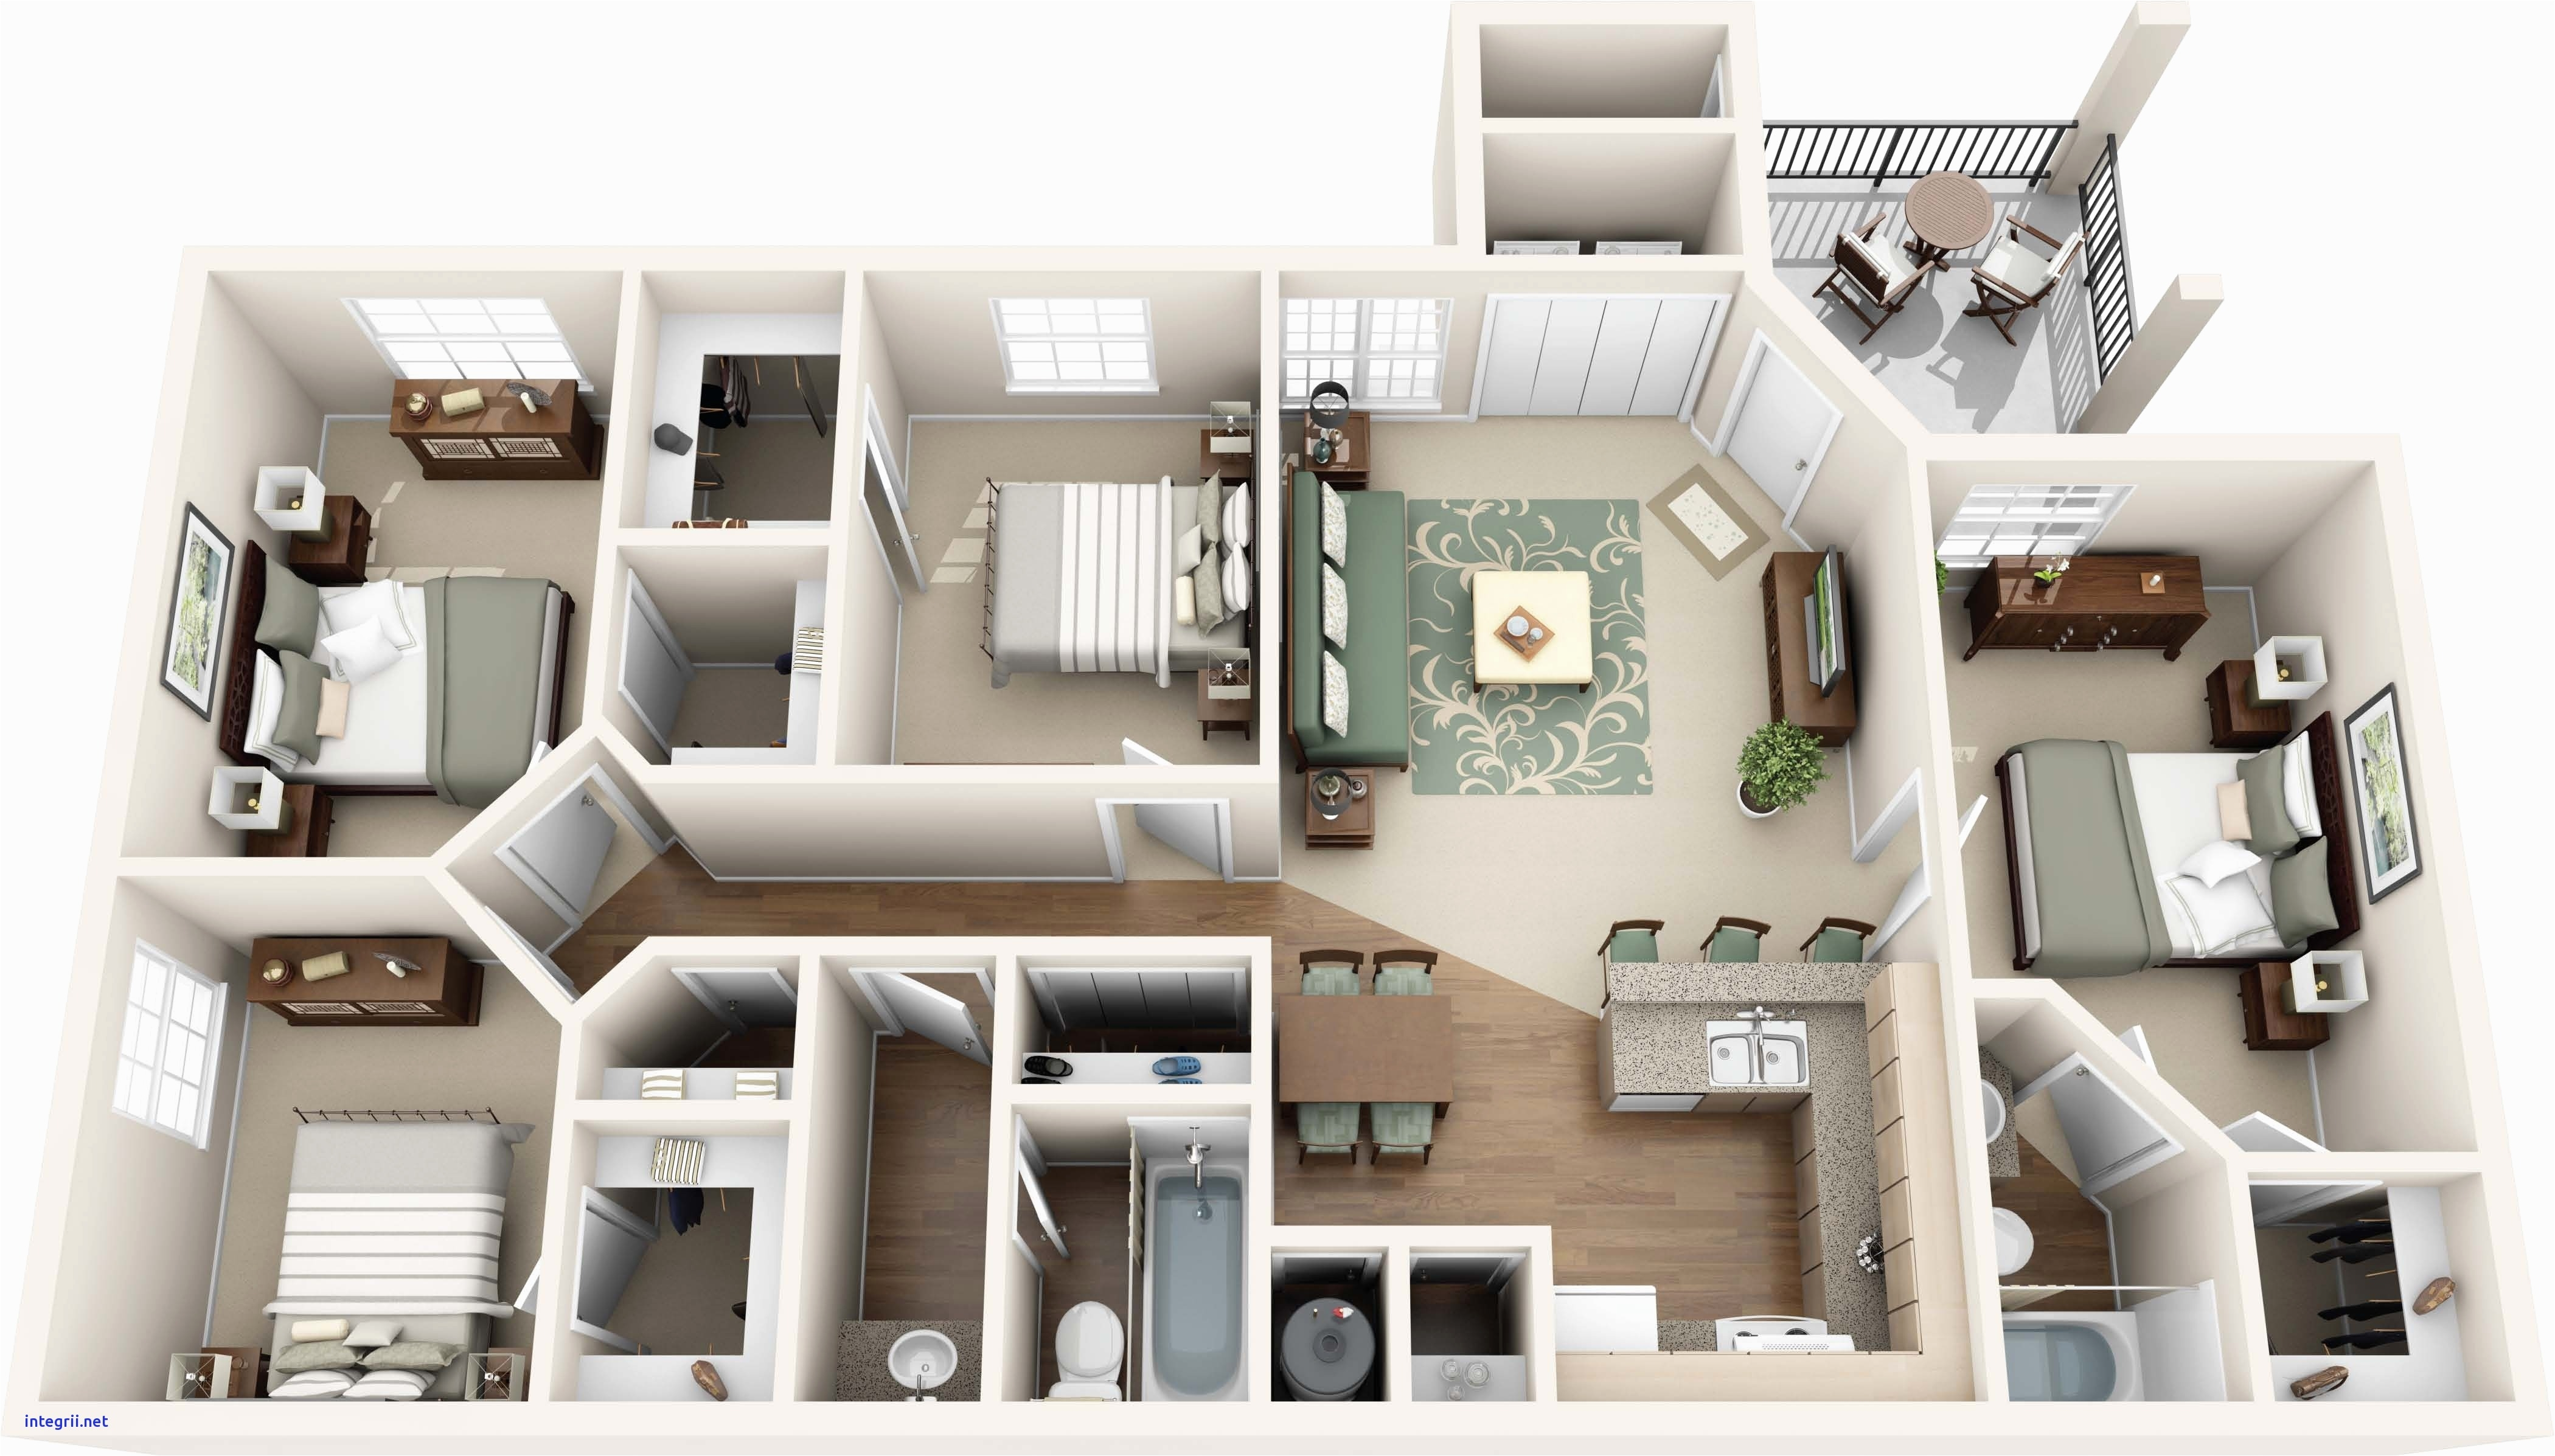 3 bedroom apartments in orlando elegant 4 bedroom apartments unique bedroom fresh 4 bedroom apartments in